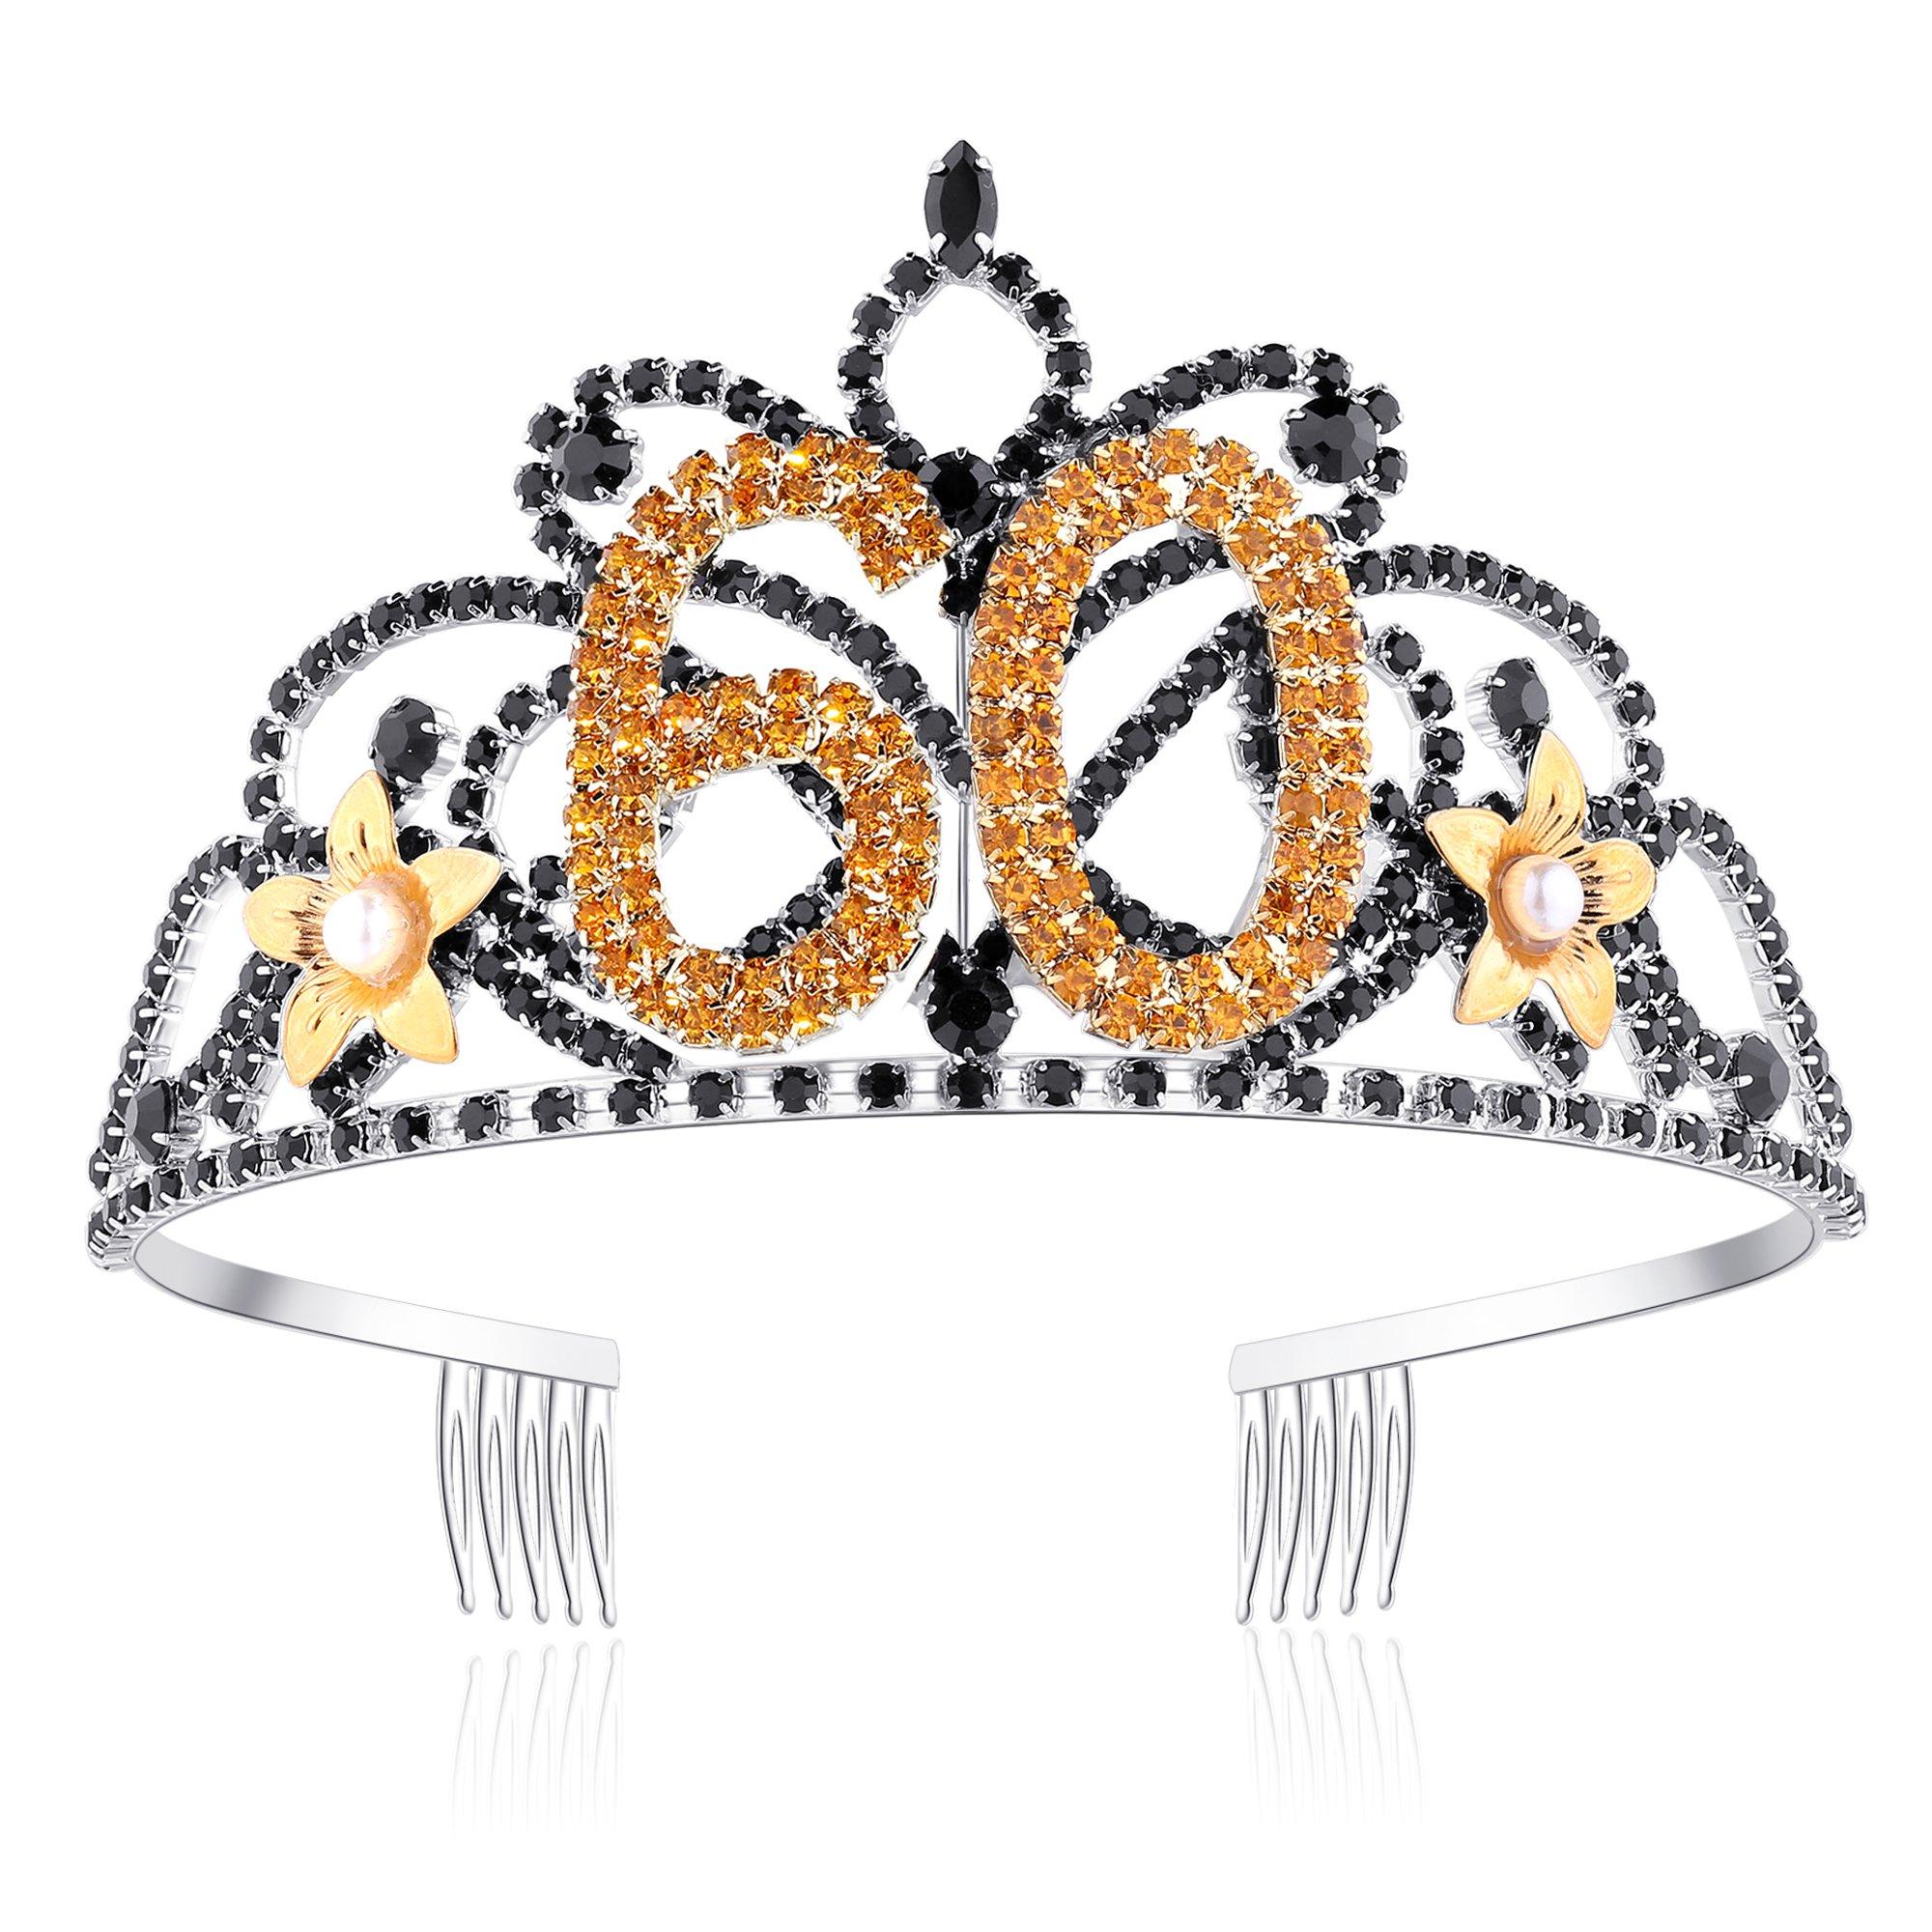 Amazon.com: 60 & Fabulous Lace Sash